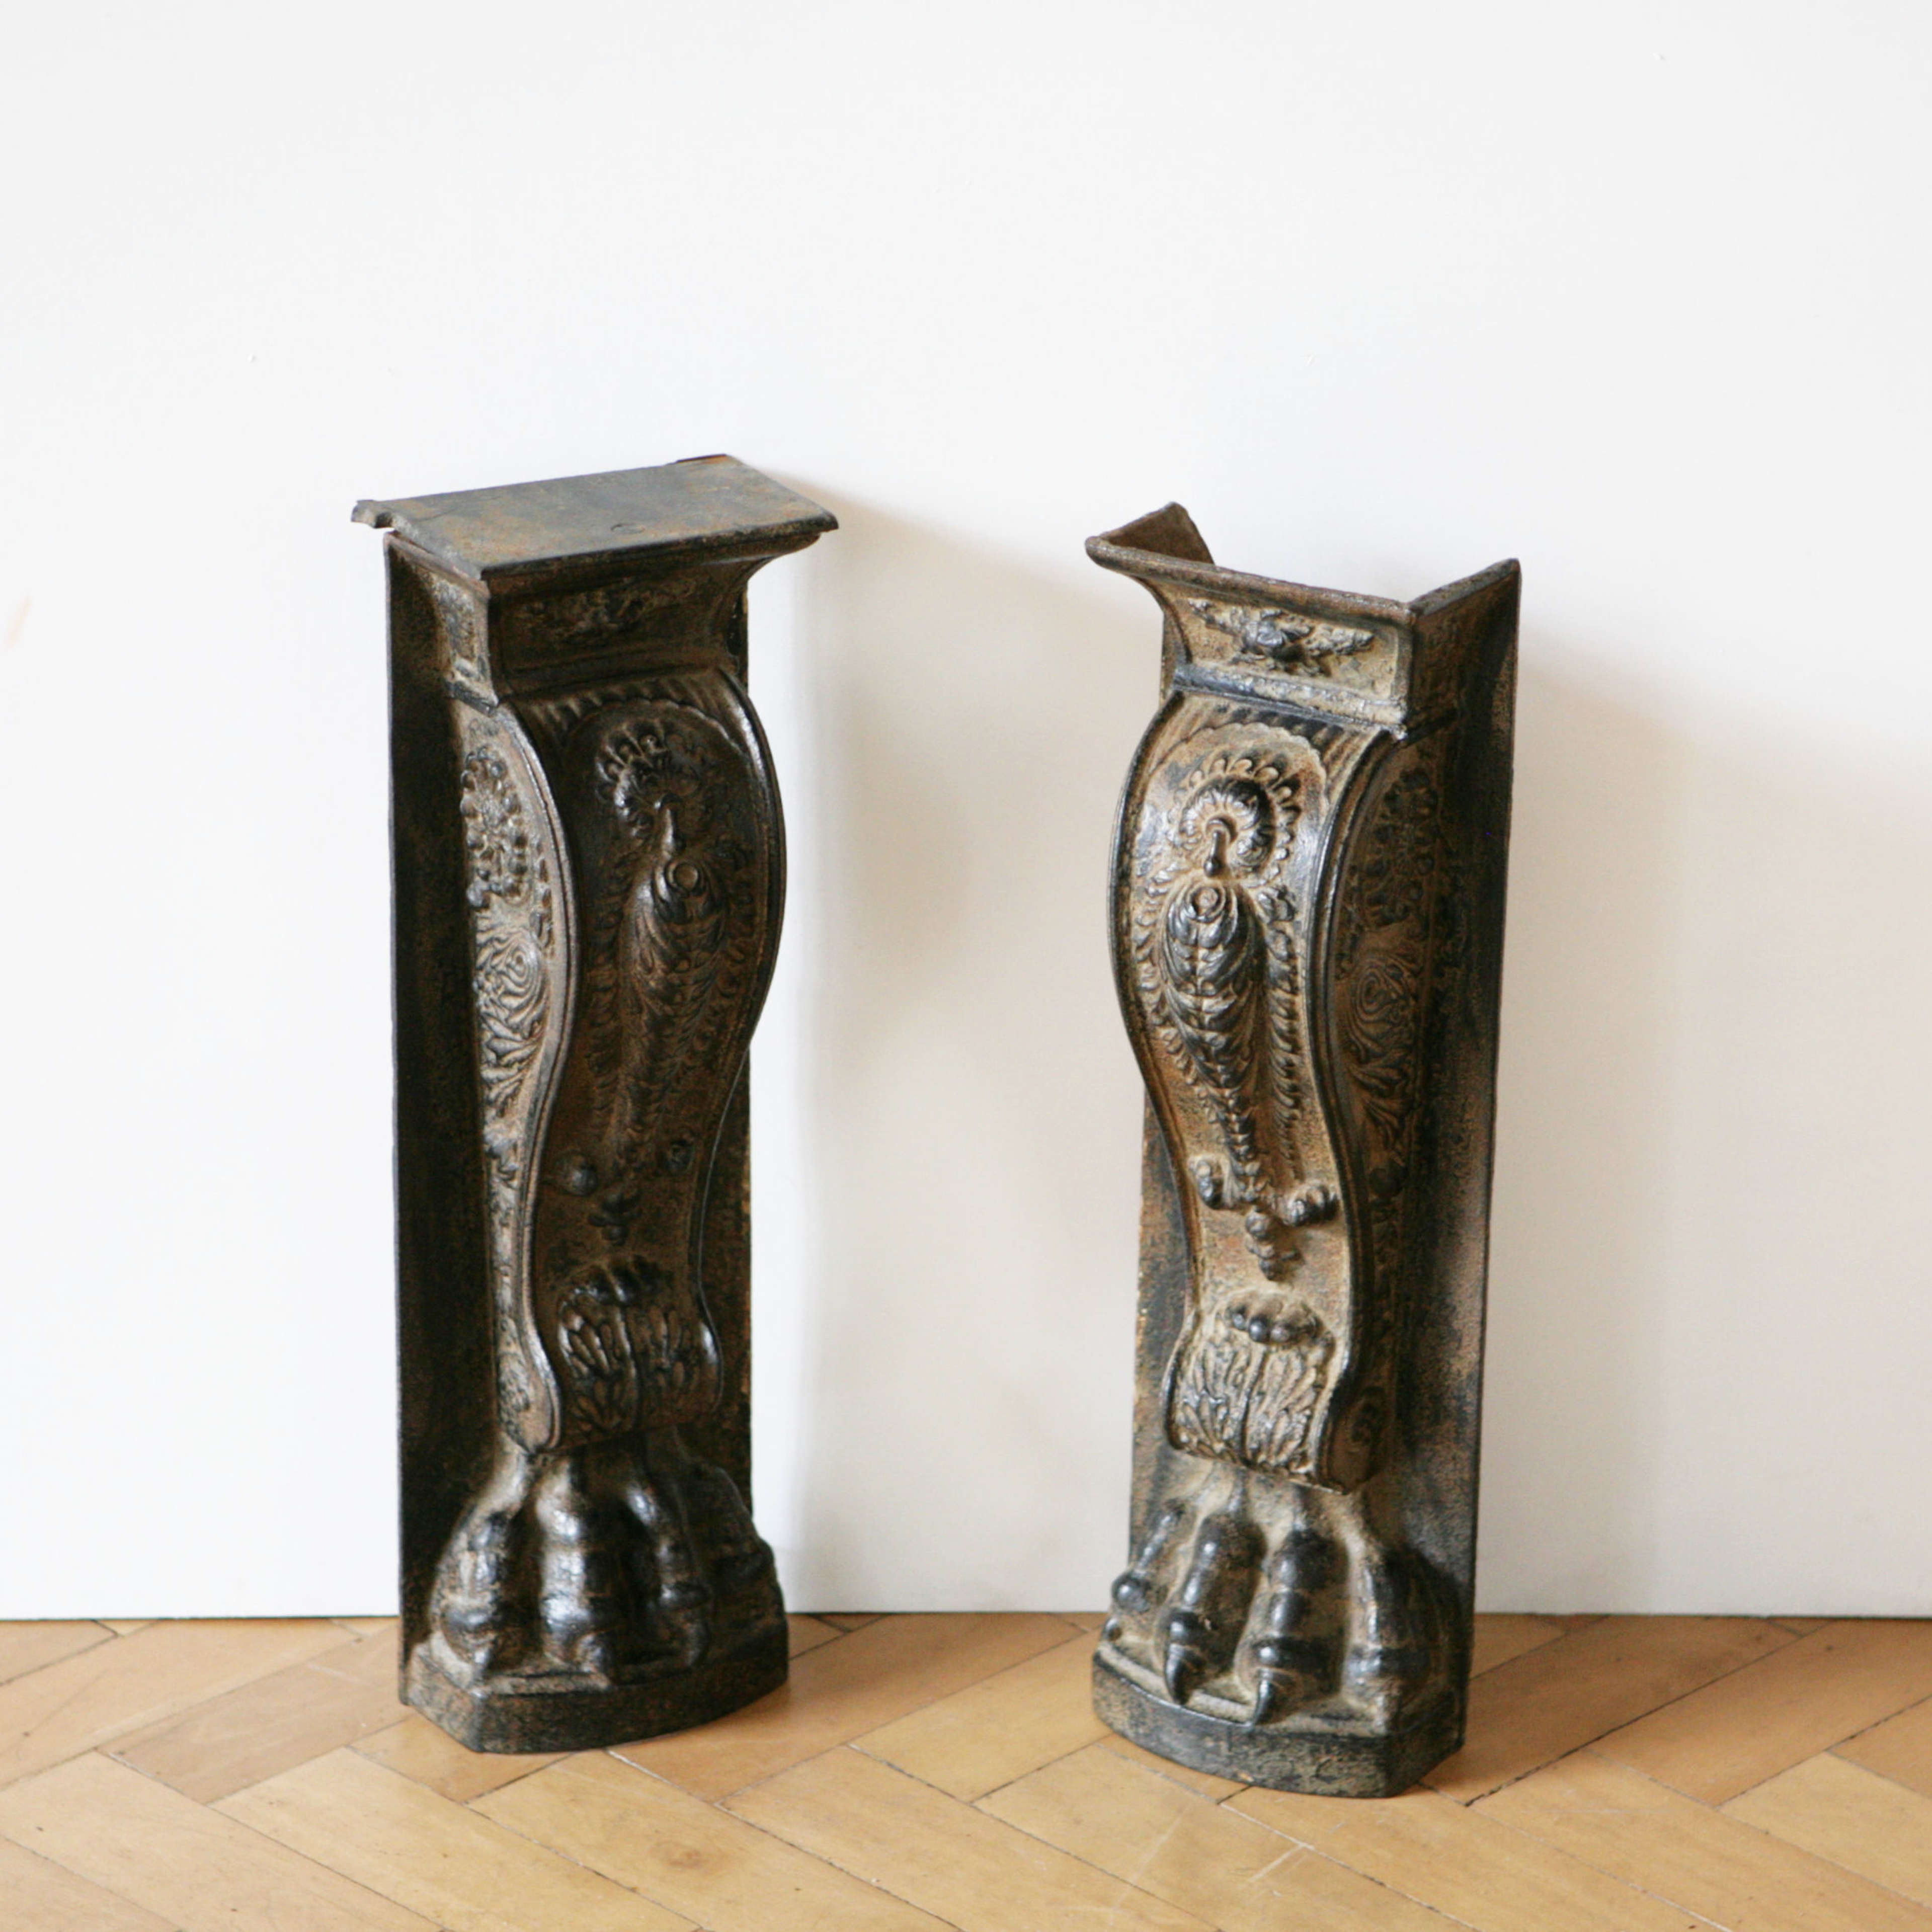 Pair of architectural cast iron lion paw columns